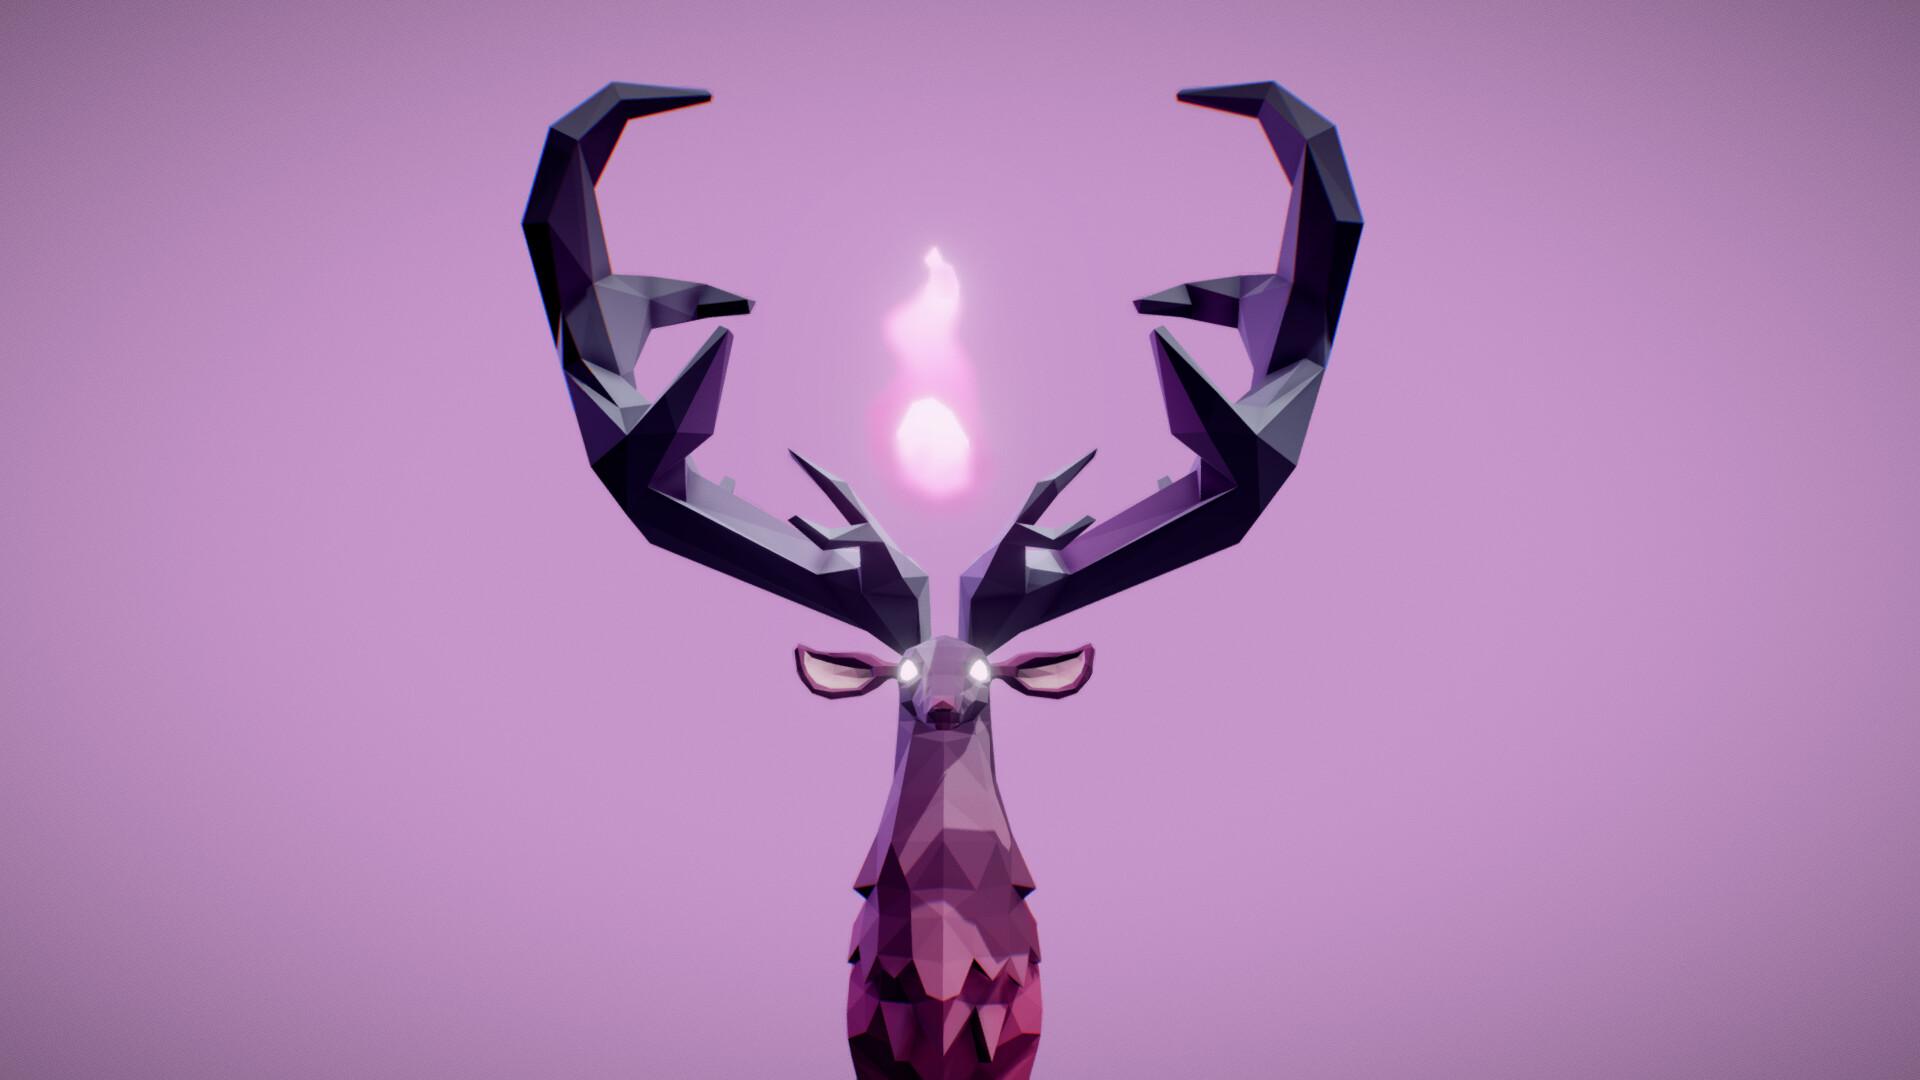 Fabian orrego fantasy deer locomotion animations 3